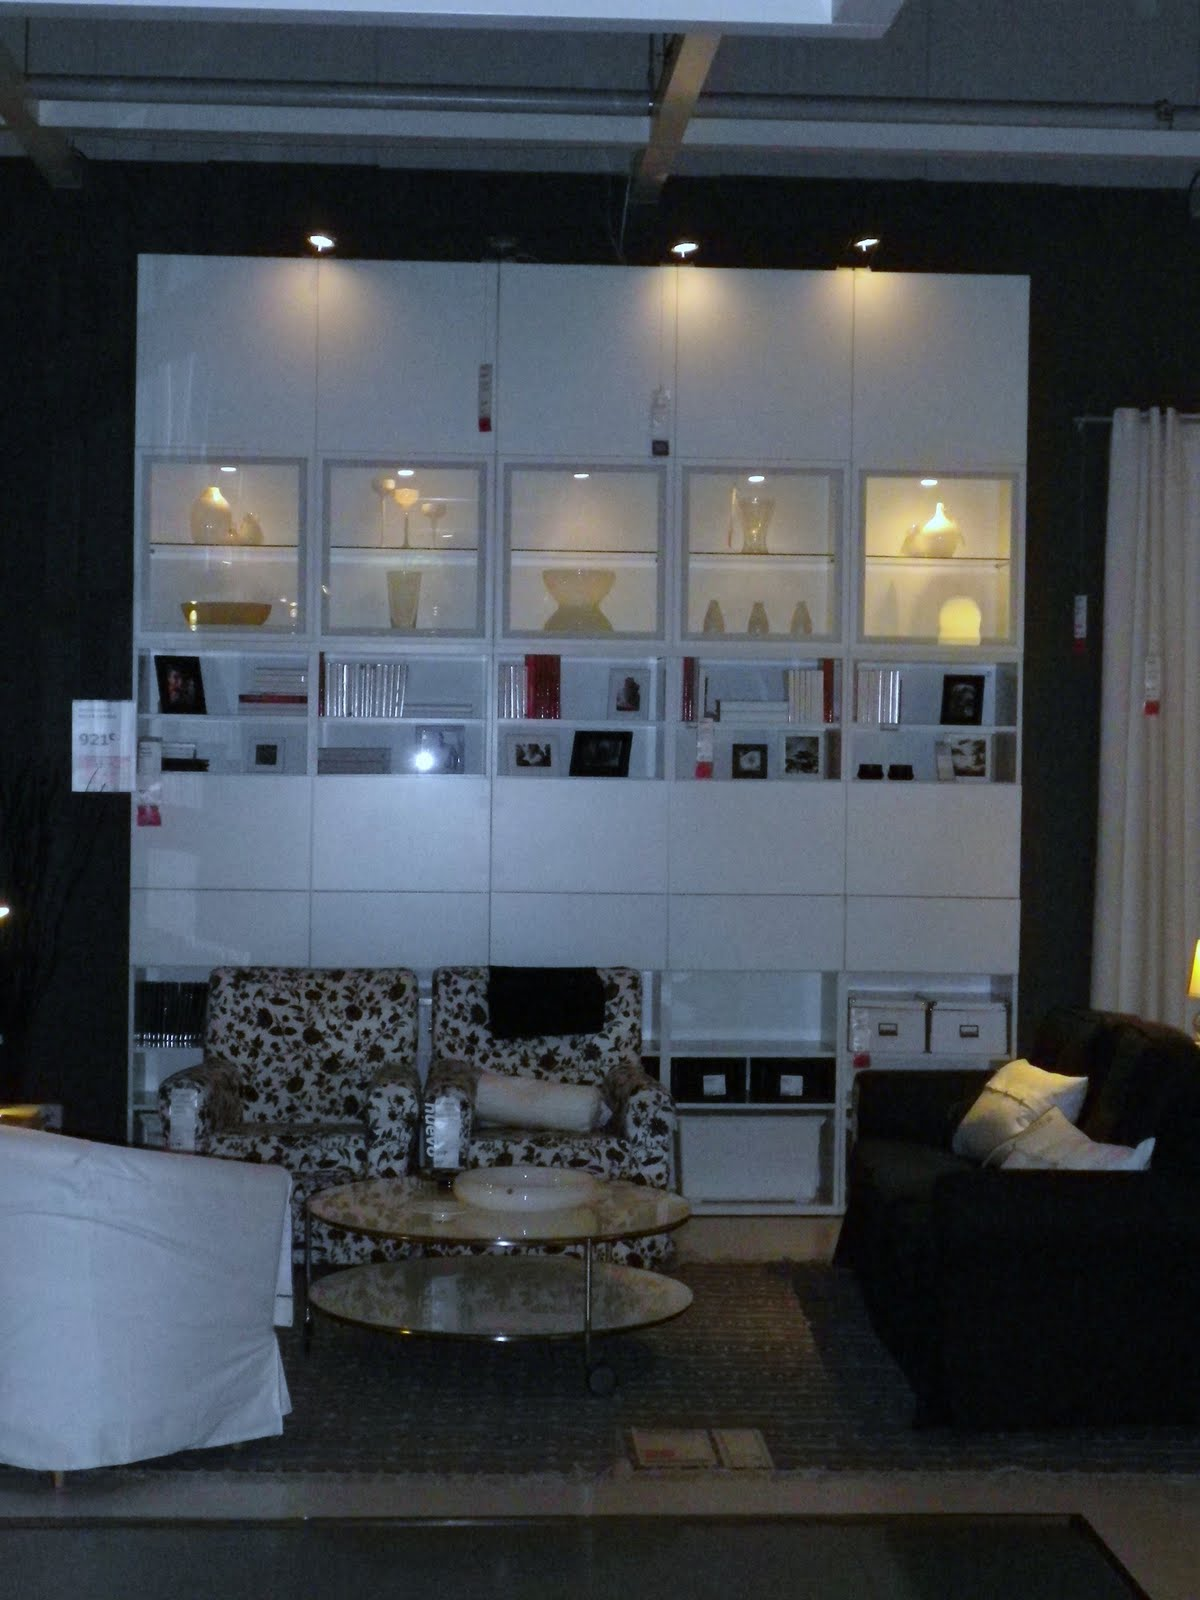 Salones Besta de Ikea Madrid del Este II  x4duroscom